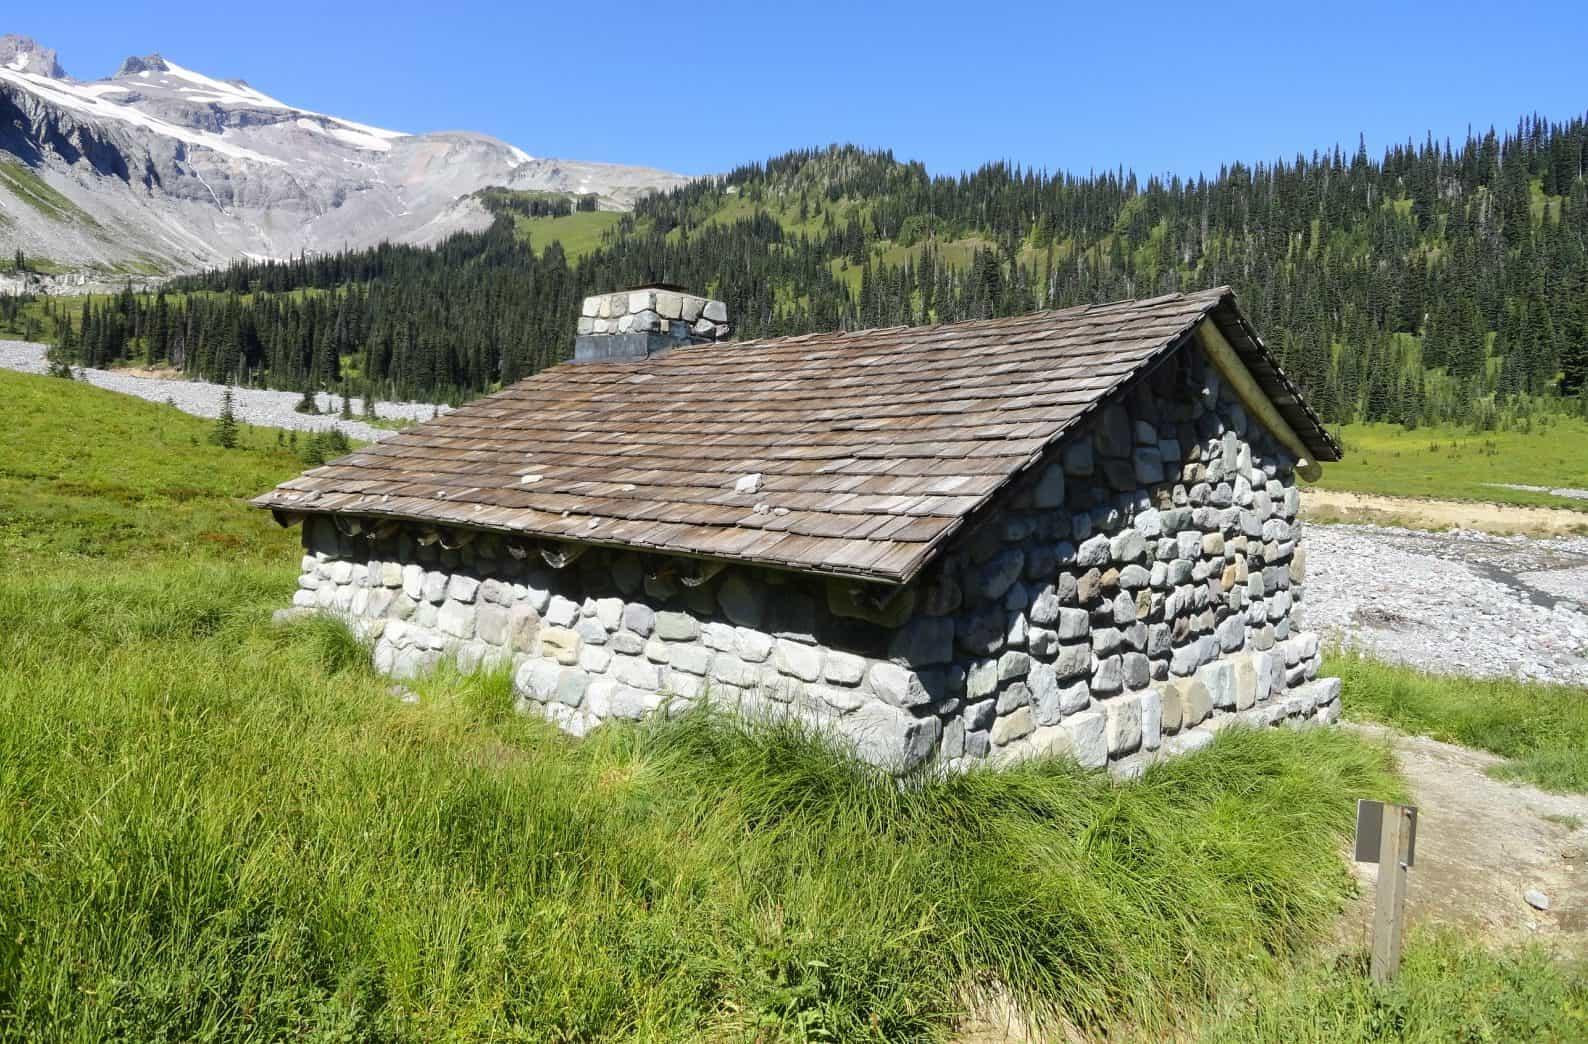 historic Indian Bar shelter